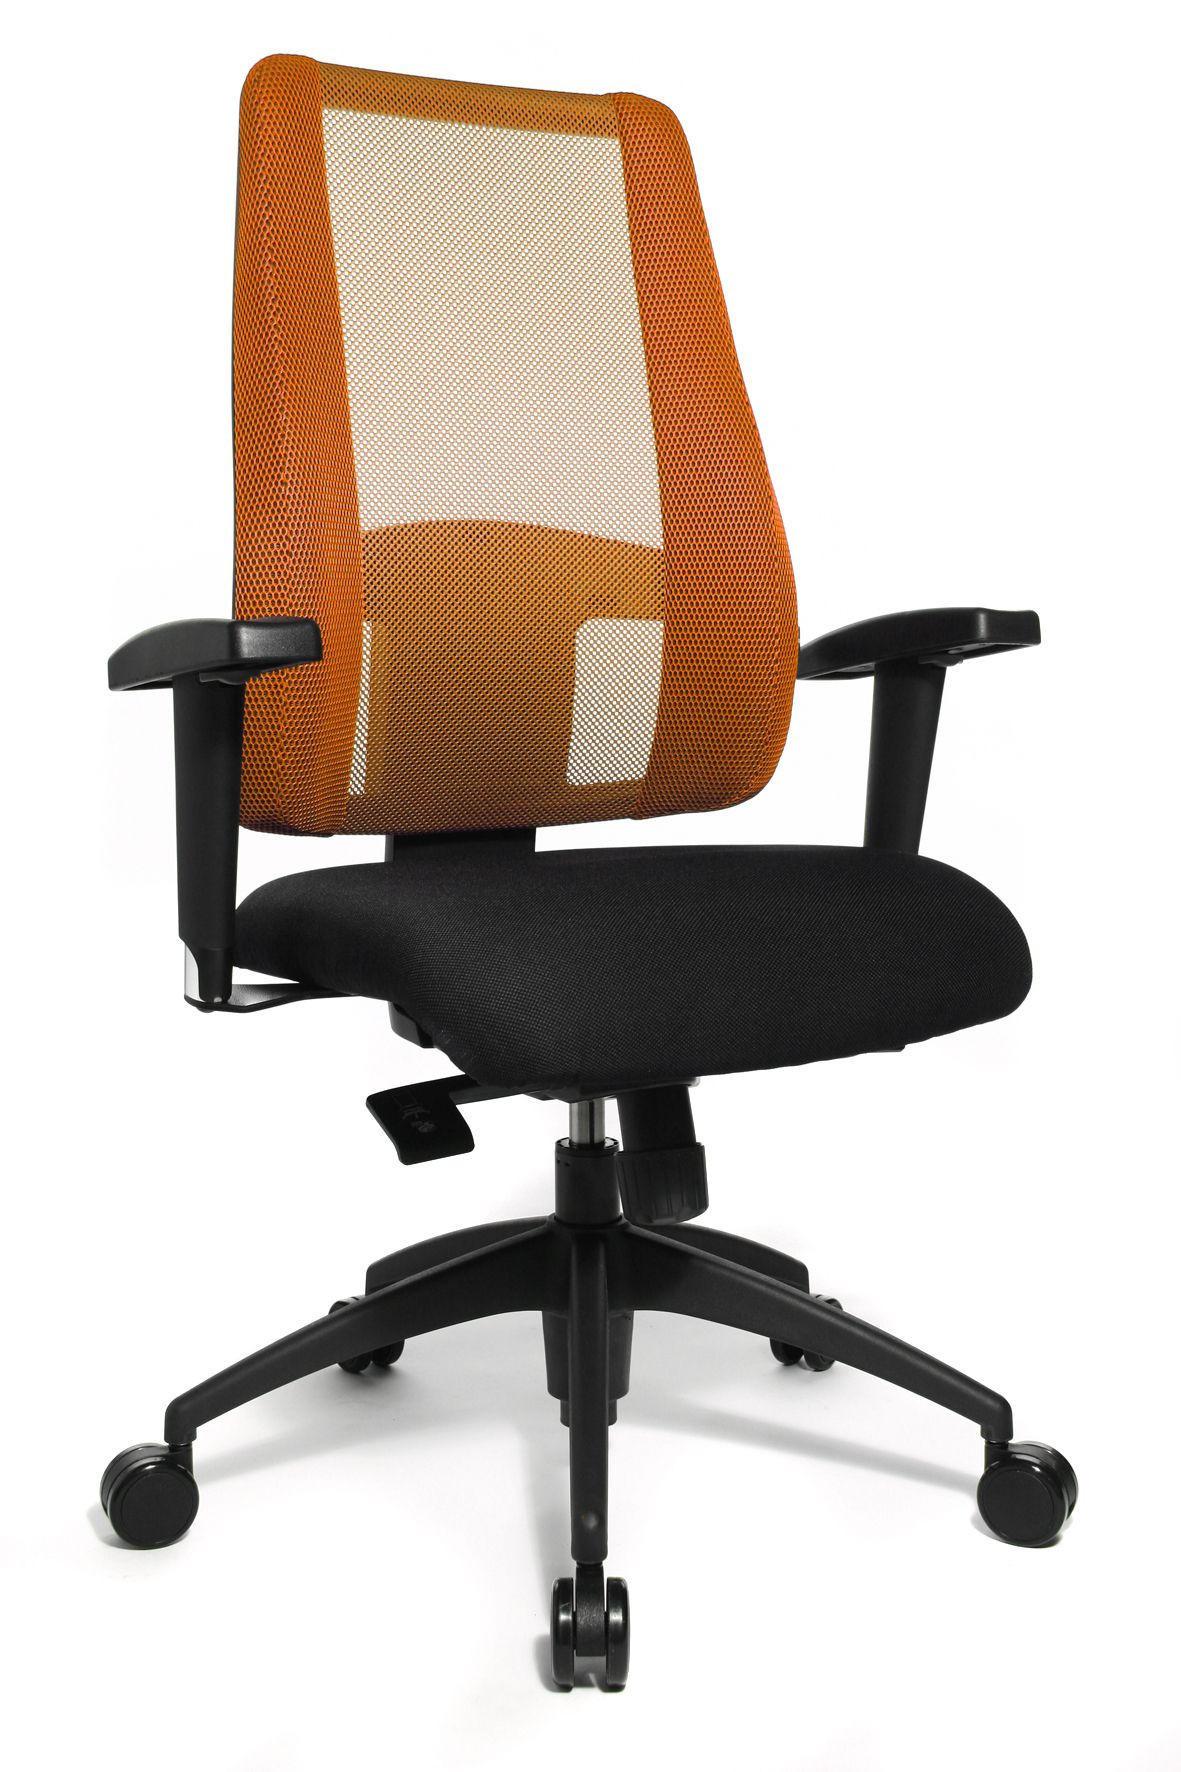 DREHSTUHL Orange, Schwarz - Schwarz/Orange, Basics, Kunststoff/Textil